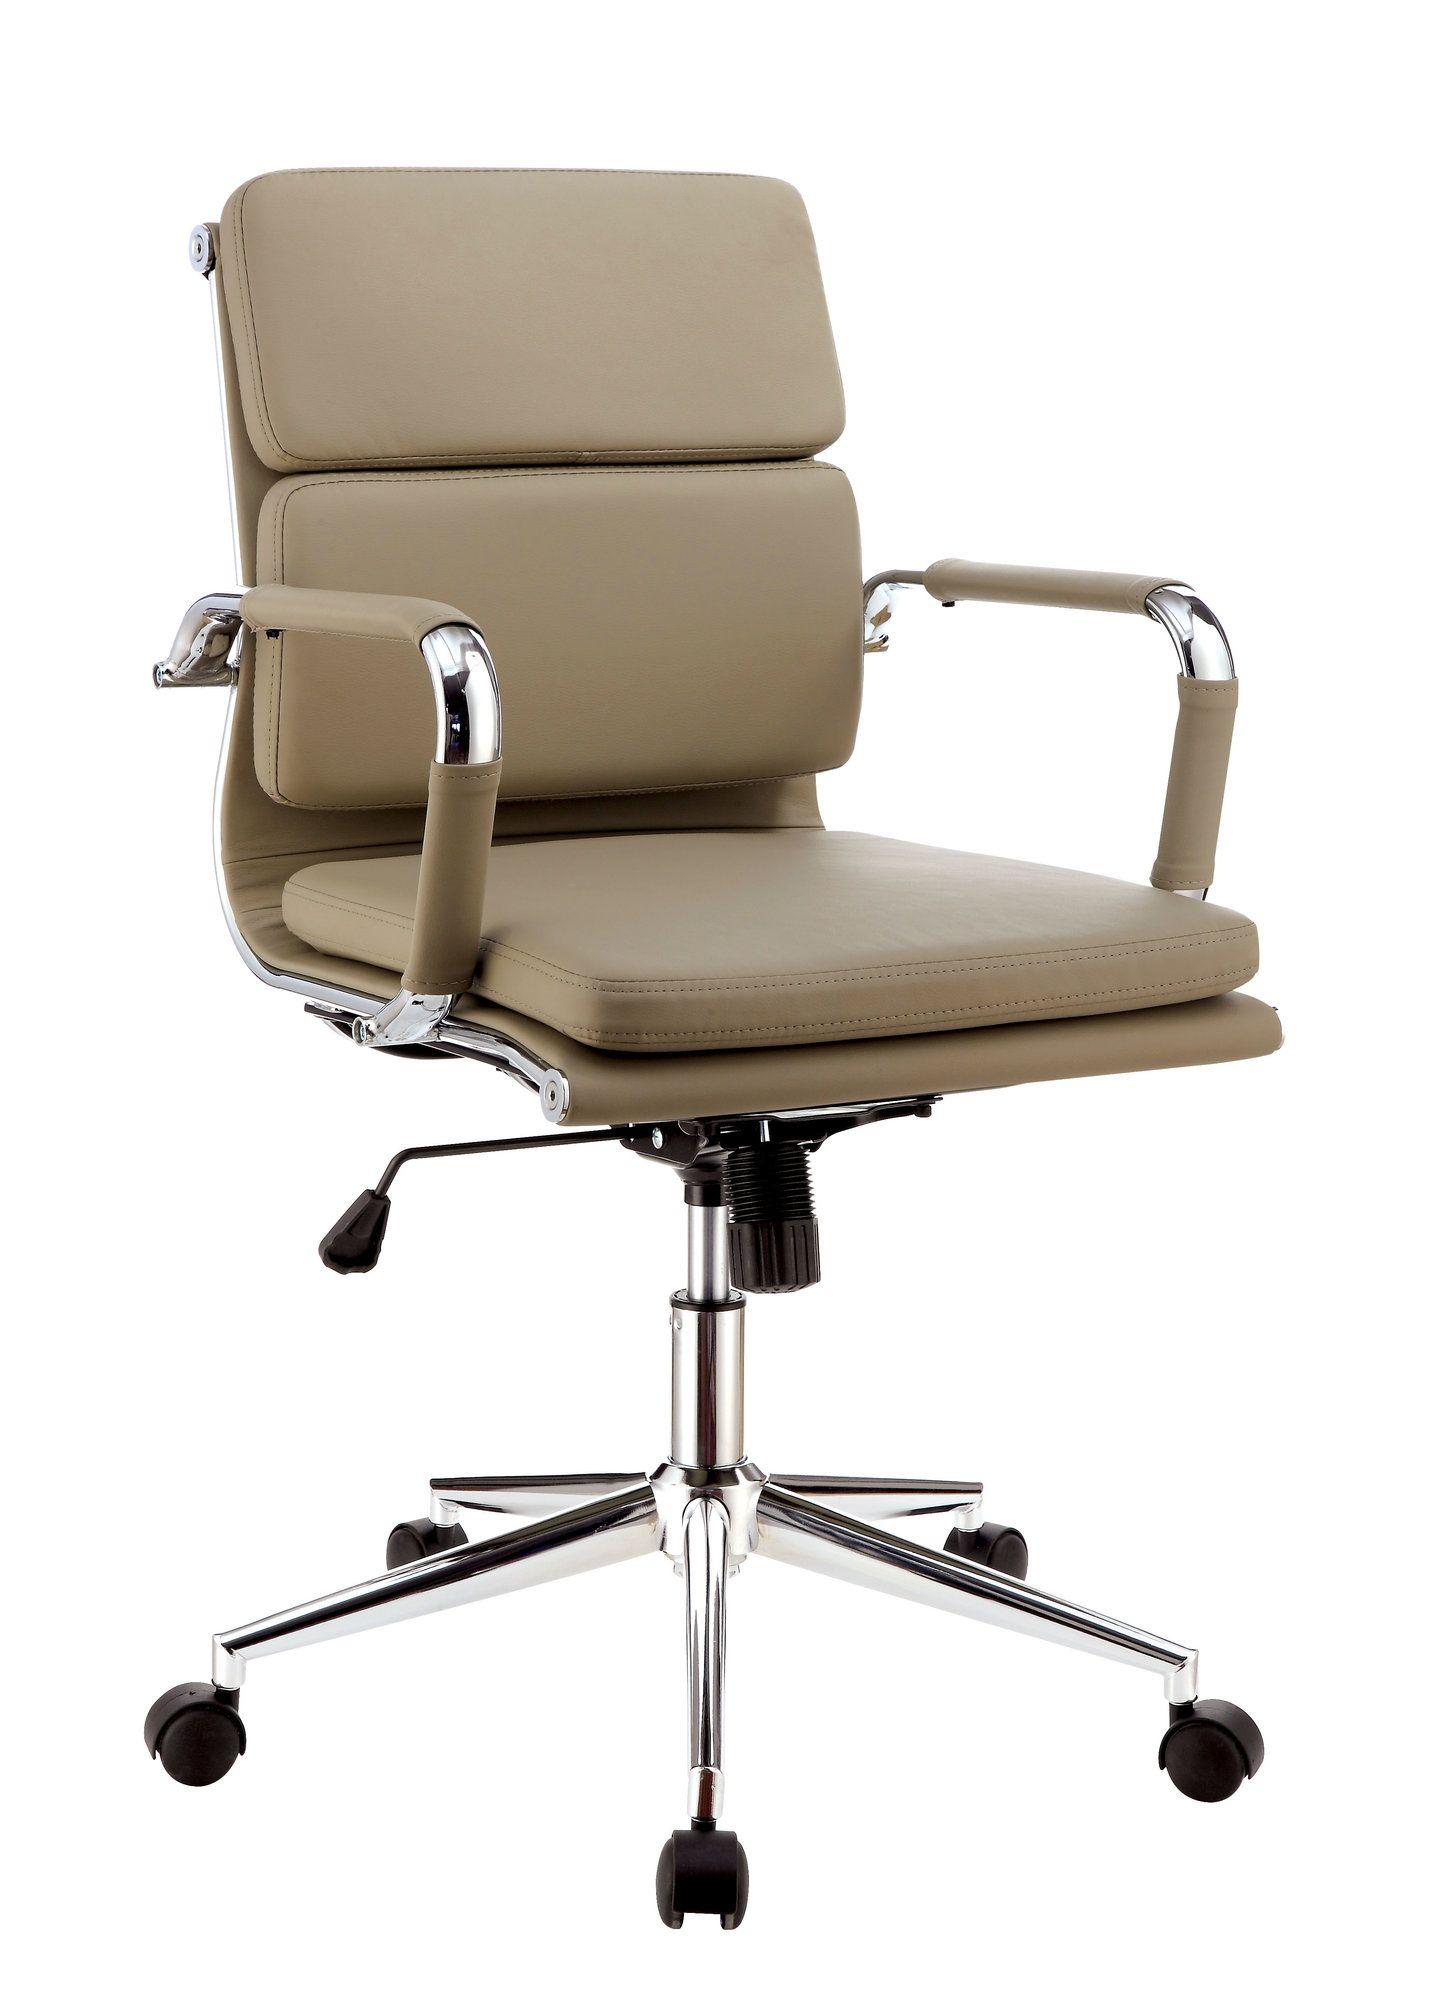 Peachy Paulo Office Chair Office In 2019 Best Office Chair Machost Co Dining Chair Design Ideas Machostcouk